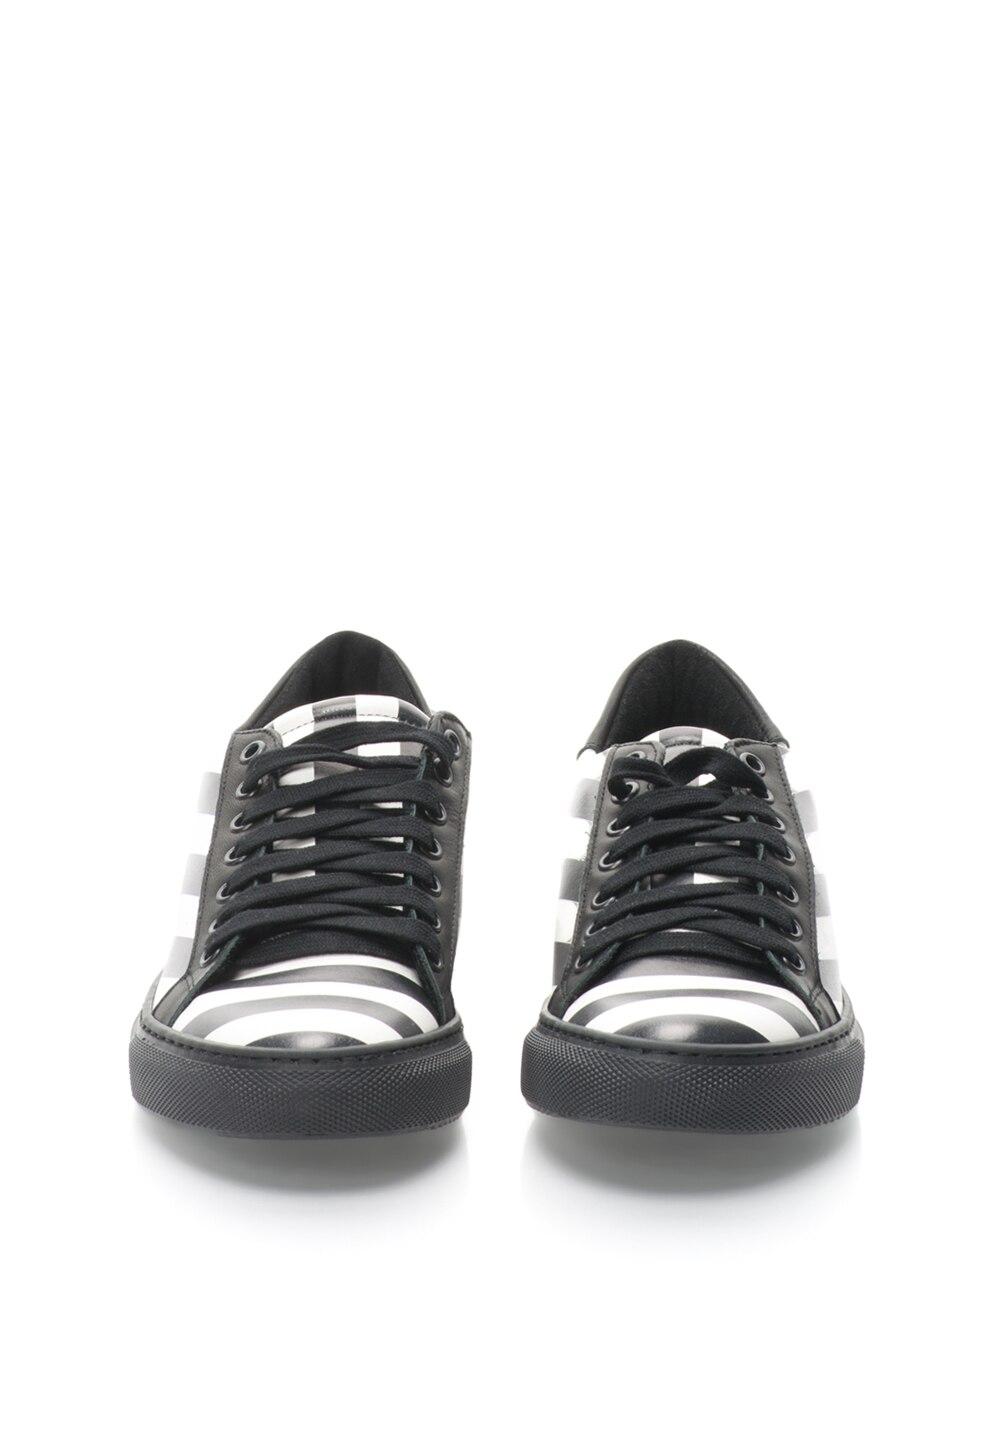 Zee Lane Fekete & Fehér Csíkos Cipő 35